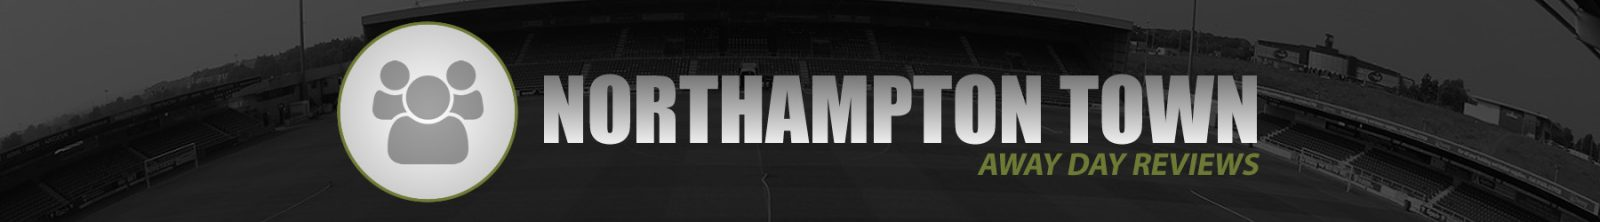 Review Northampton Town